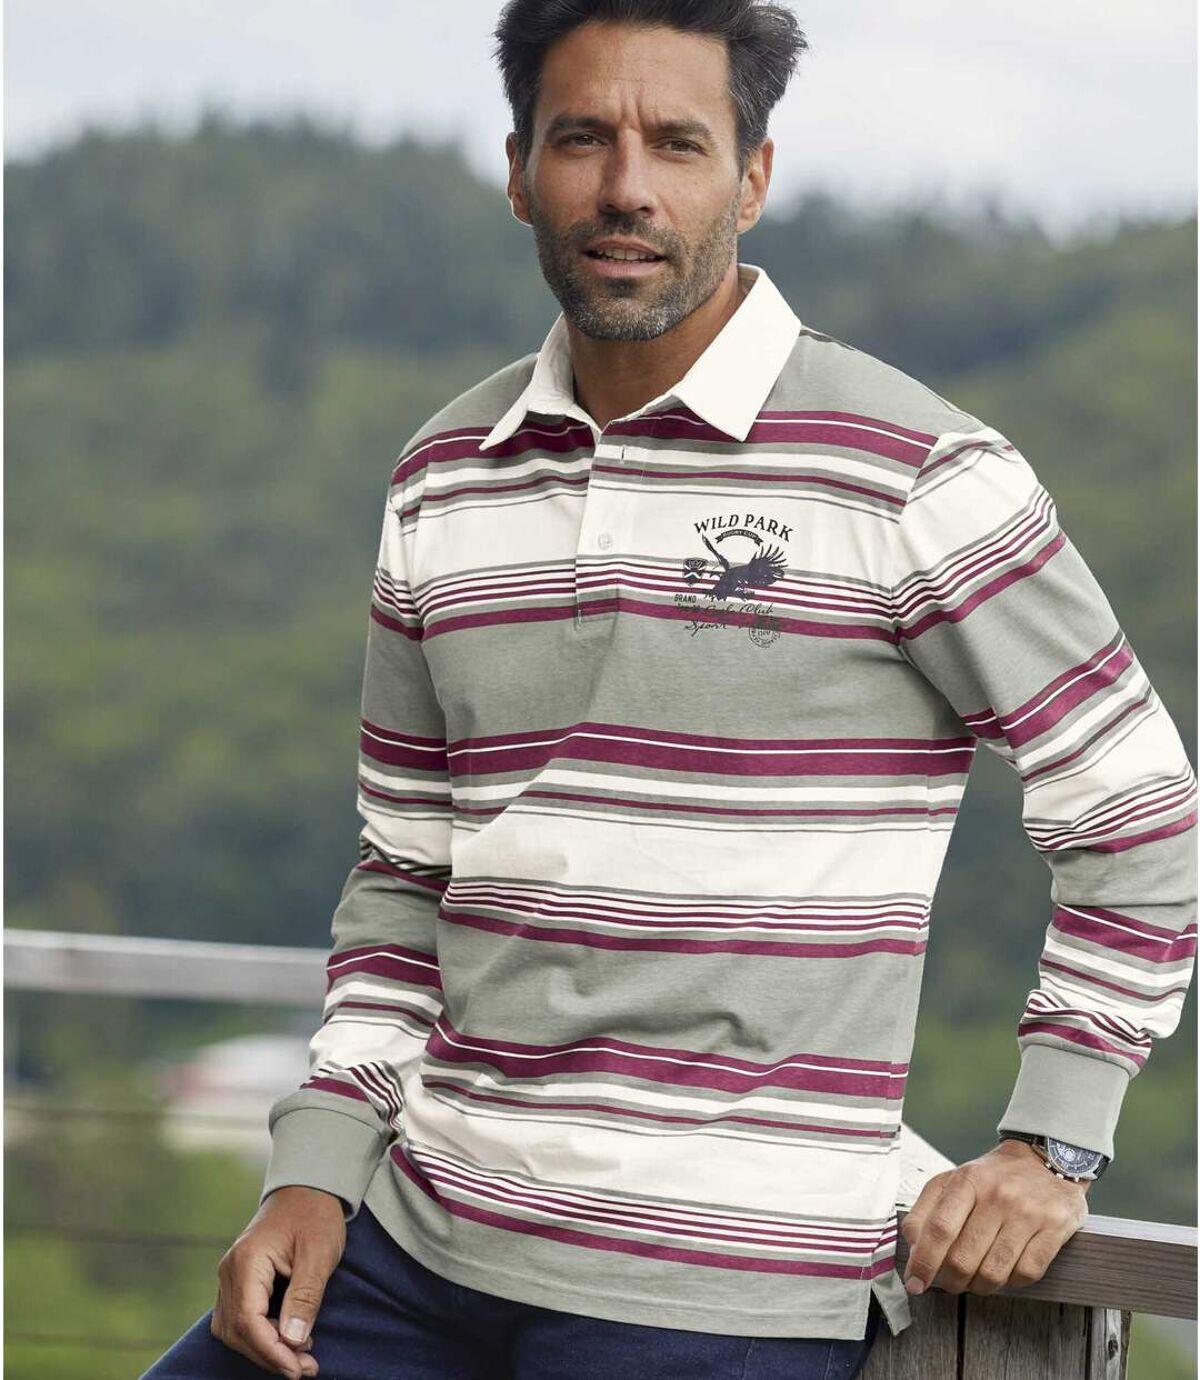 Poloshirt Sport Club im Rugby-Stil Atlas For Men